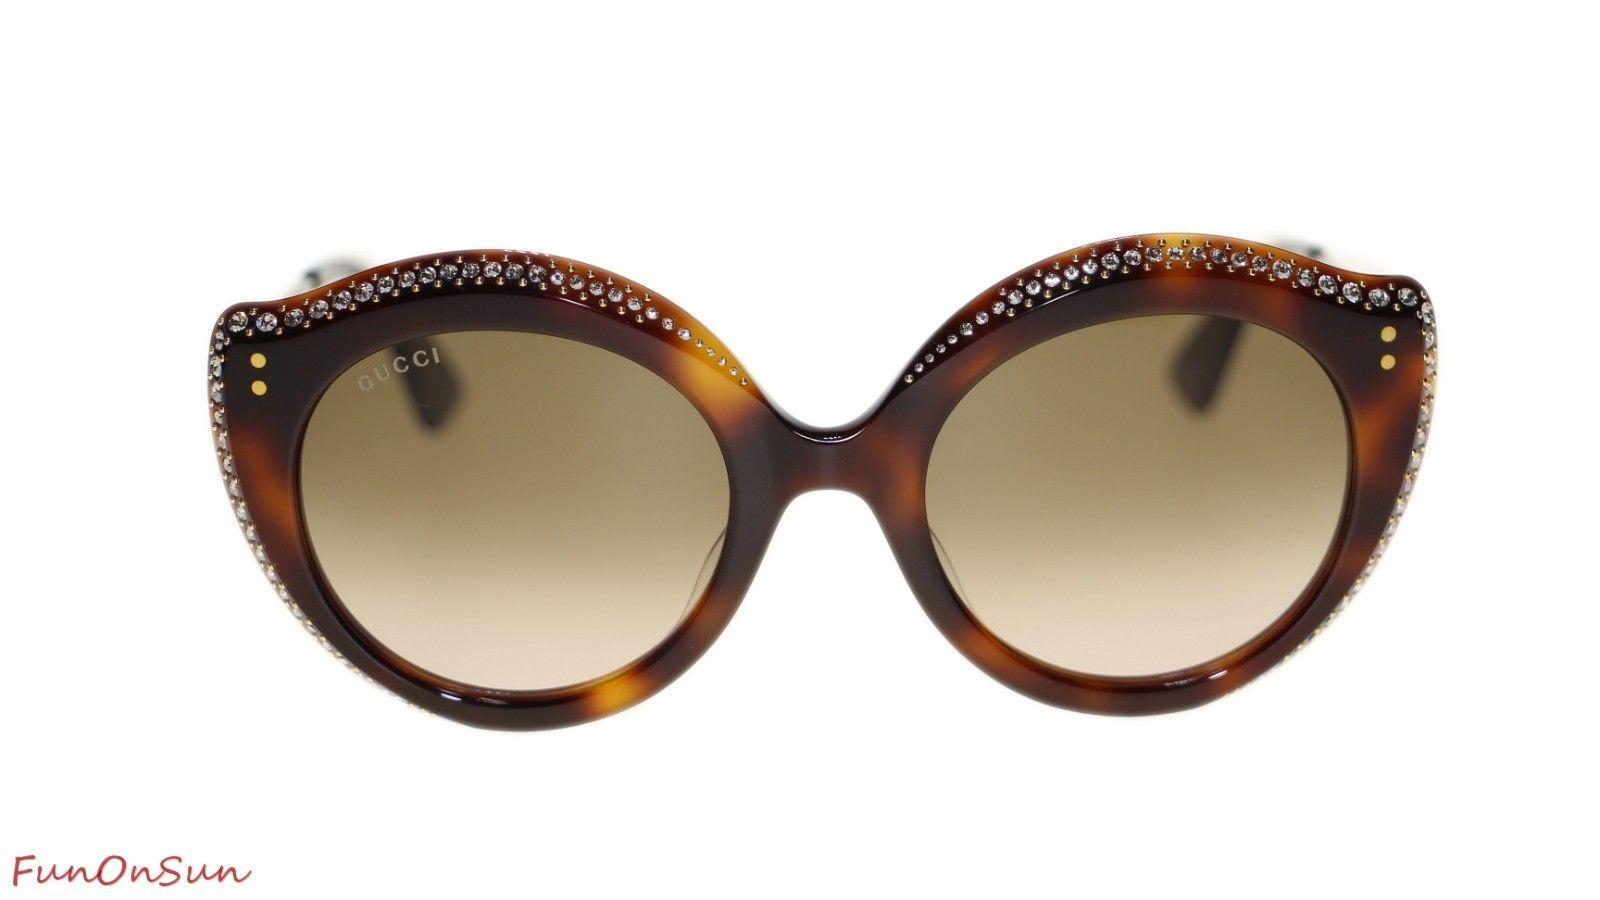 019f19a0bc Gucci Women Sunglasses GG0214S 003 Havana Brown Polarized Lens 52mm  Authentic